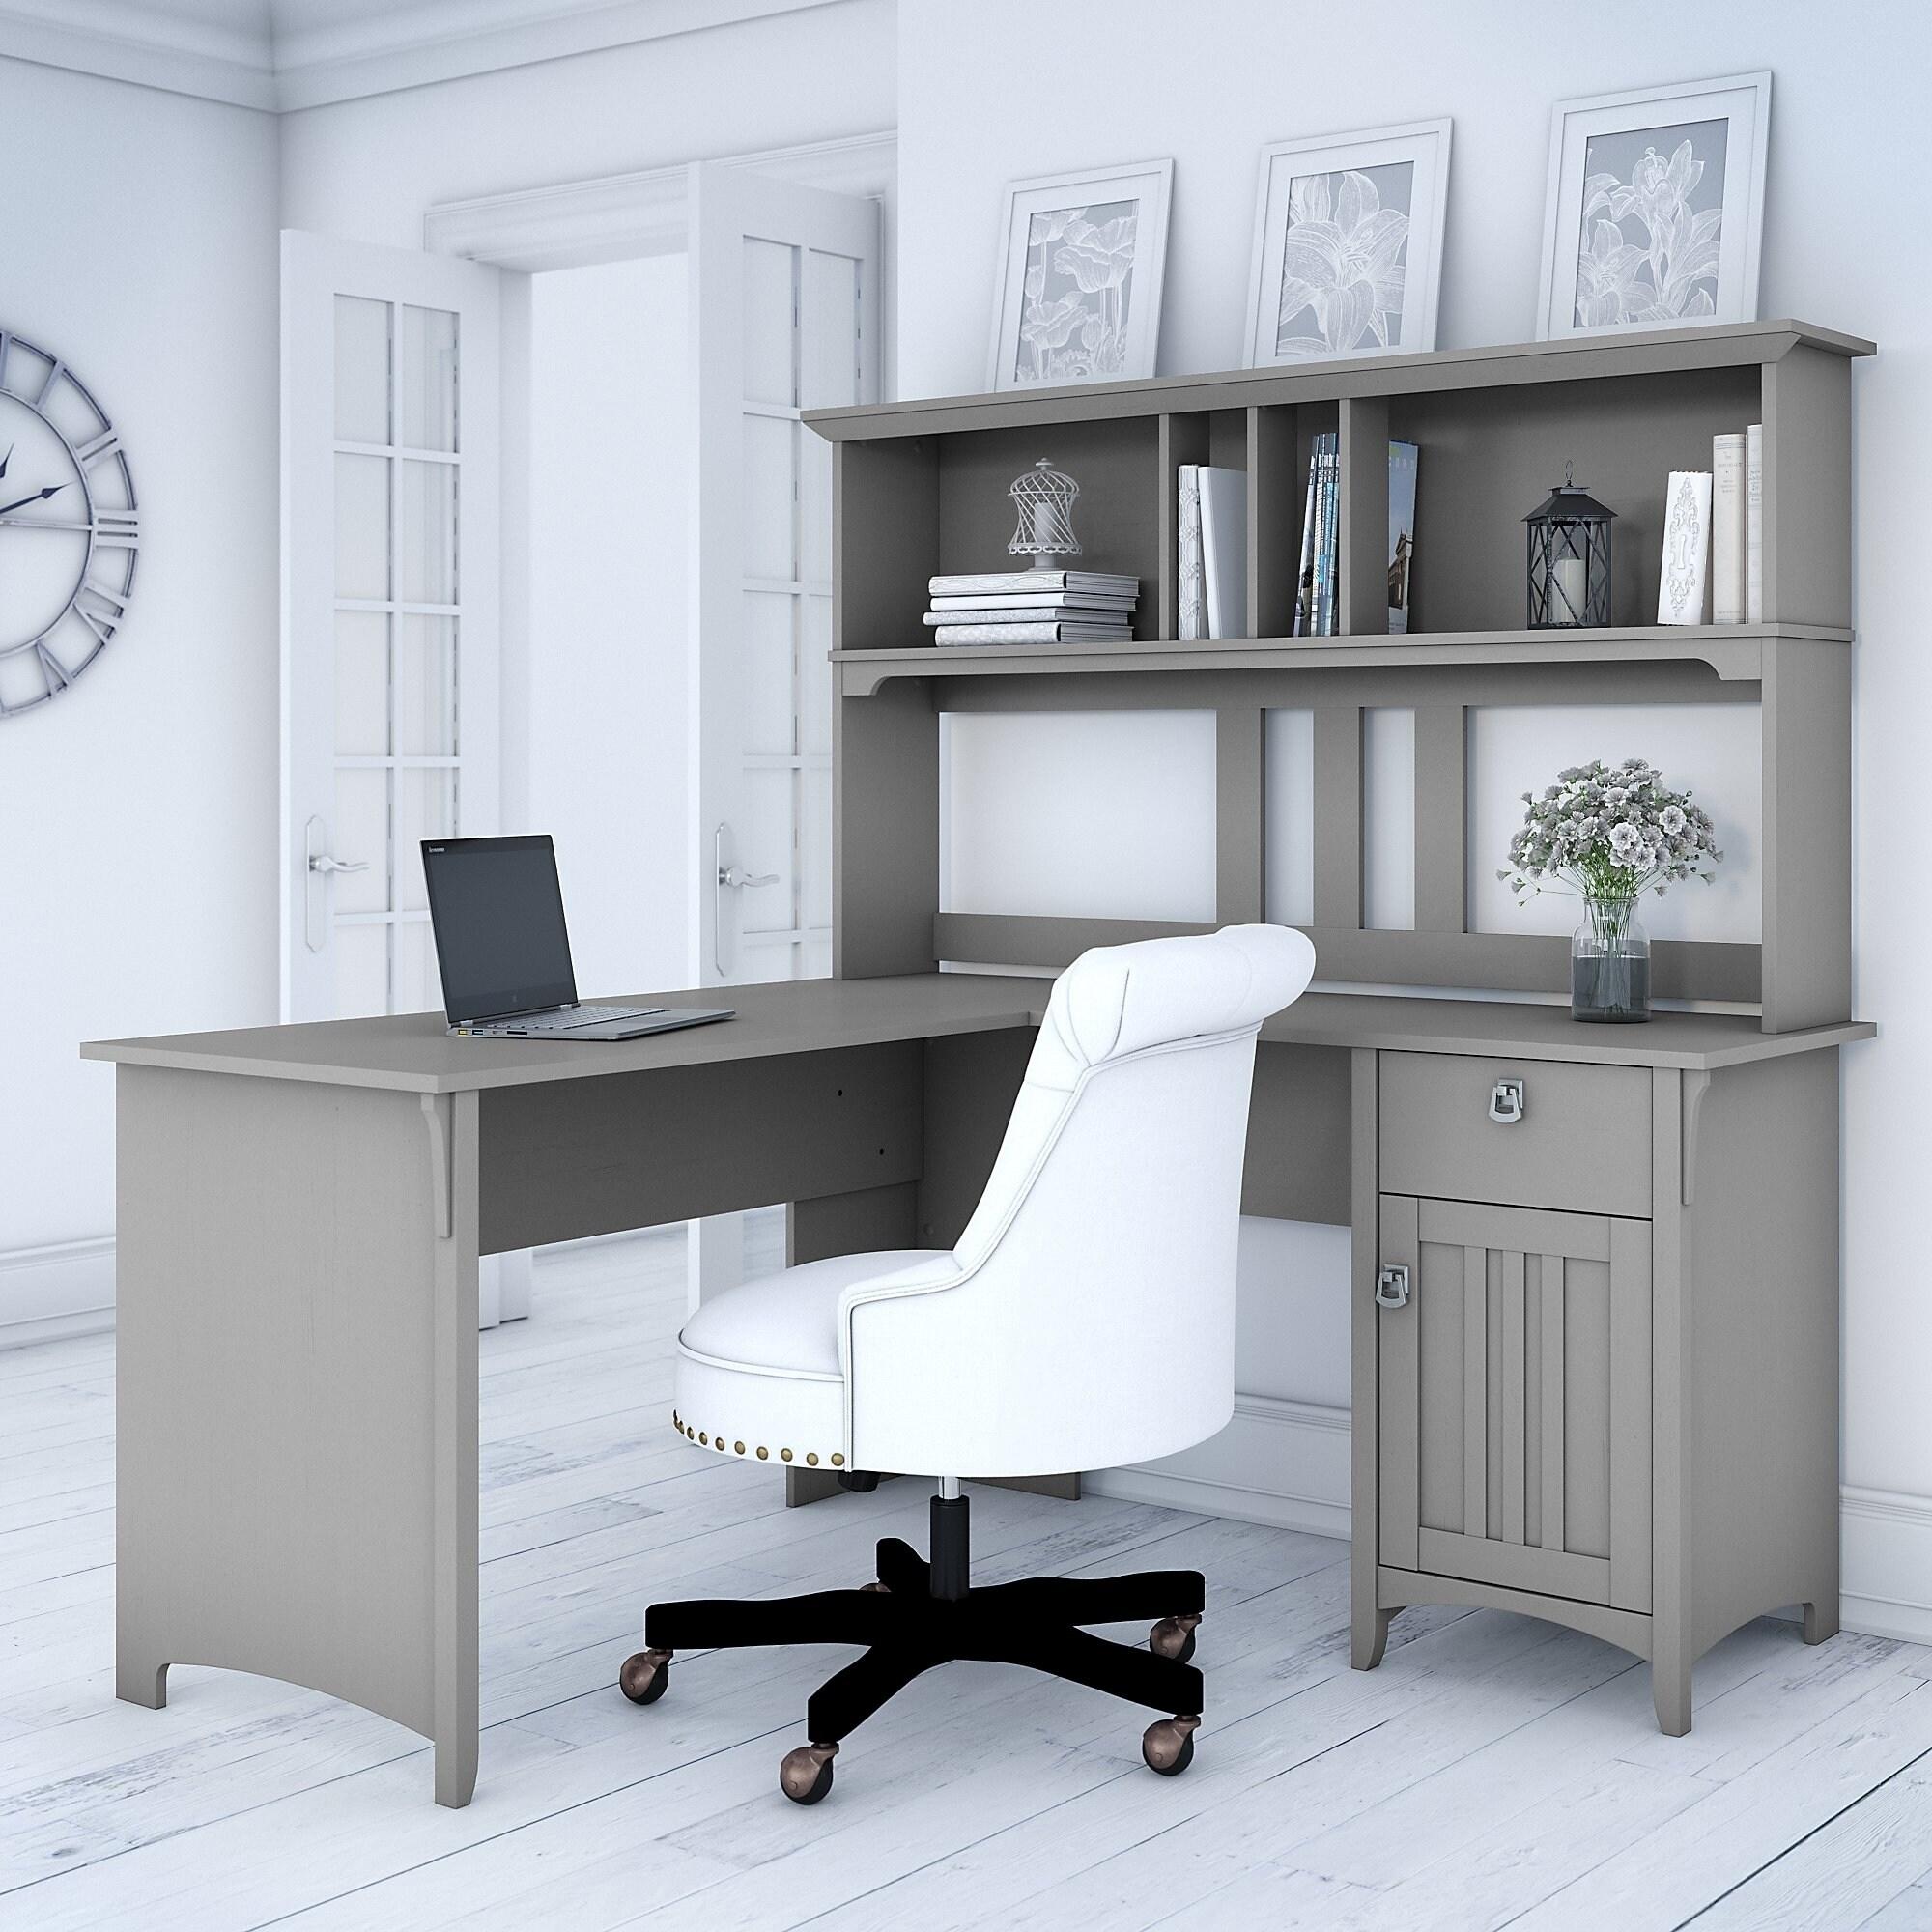 The Gray Barn Lowbridge Cape Cod Grey L Shaped Desk With Hutch